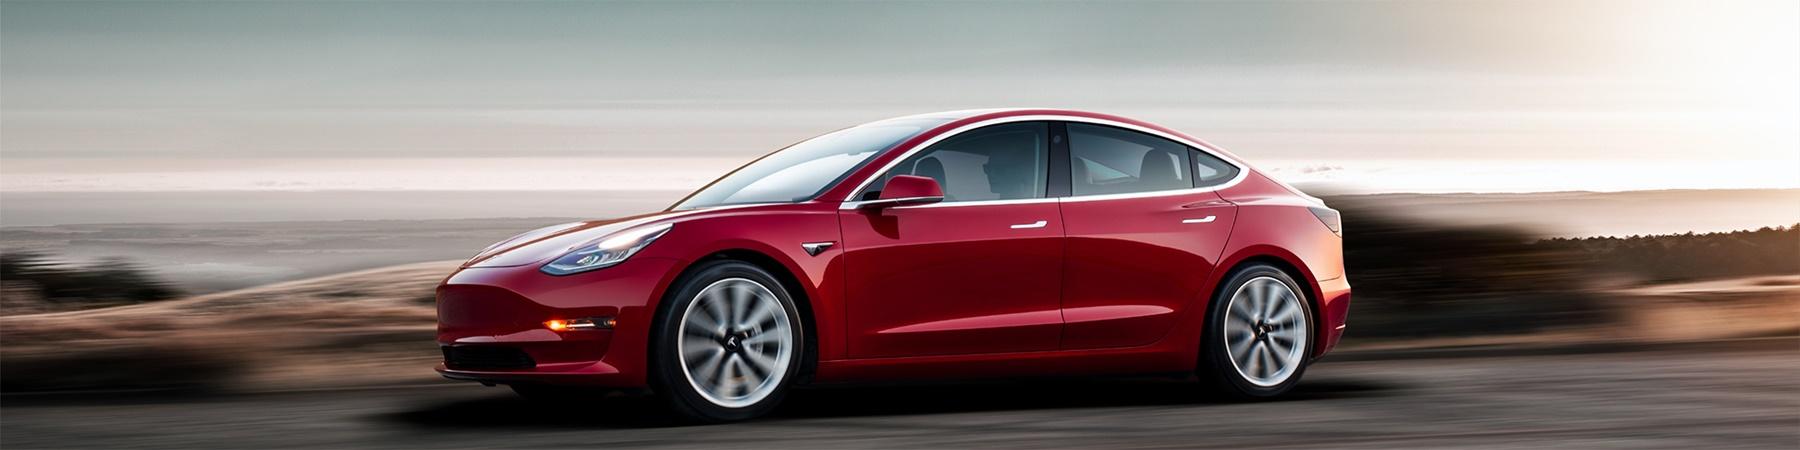 Tesla Model 3 55kWh 315 km actieradius